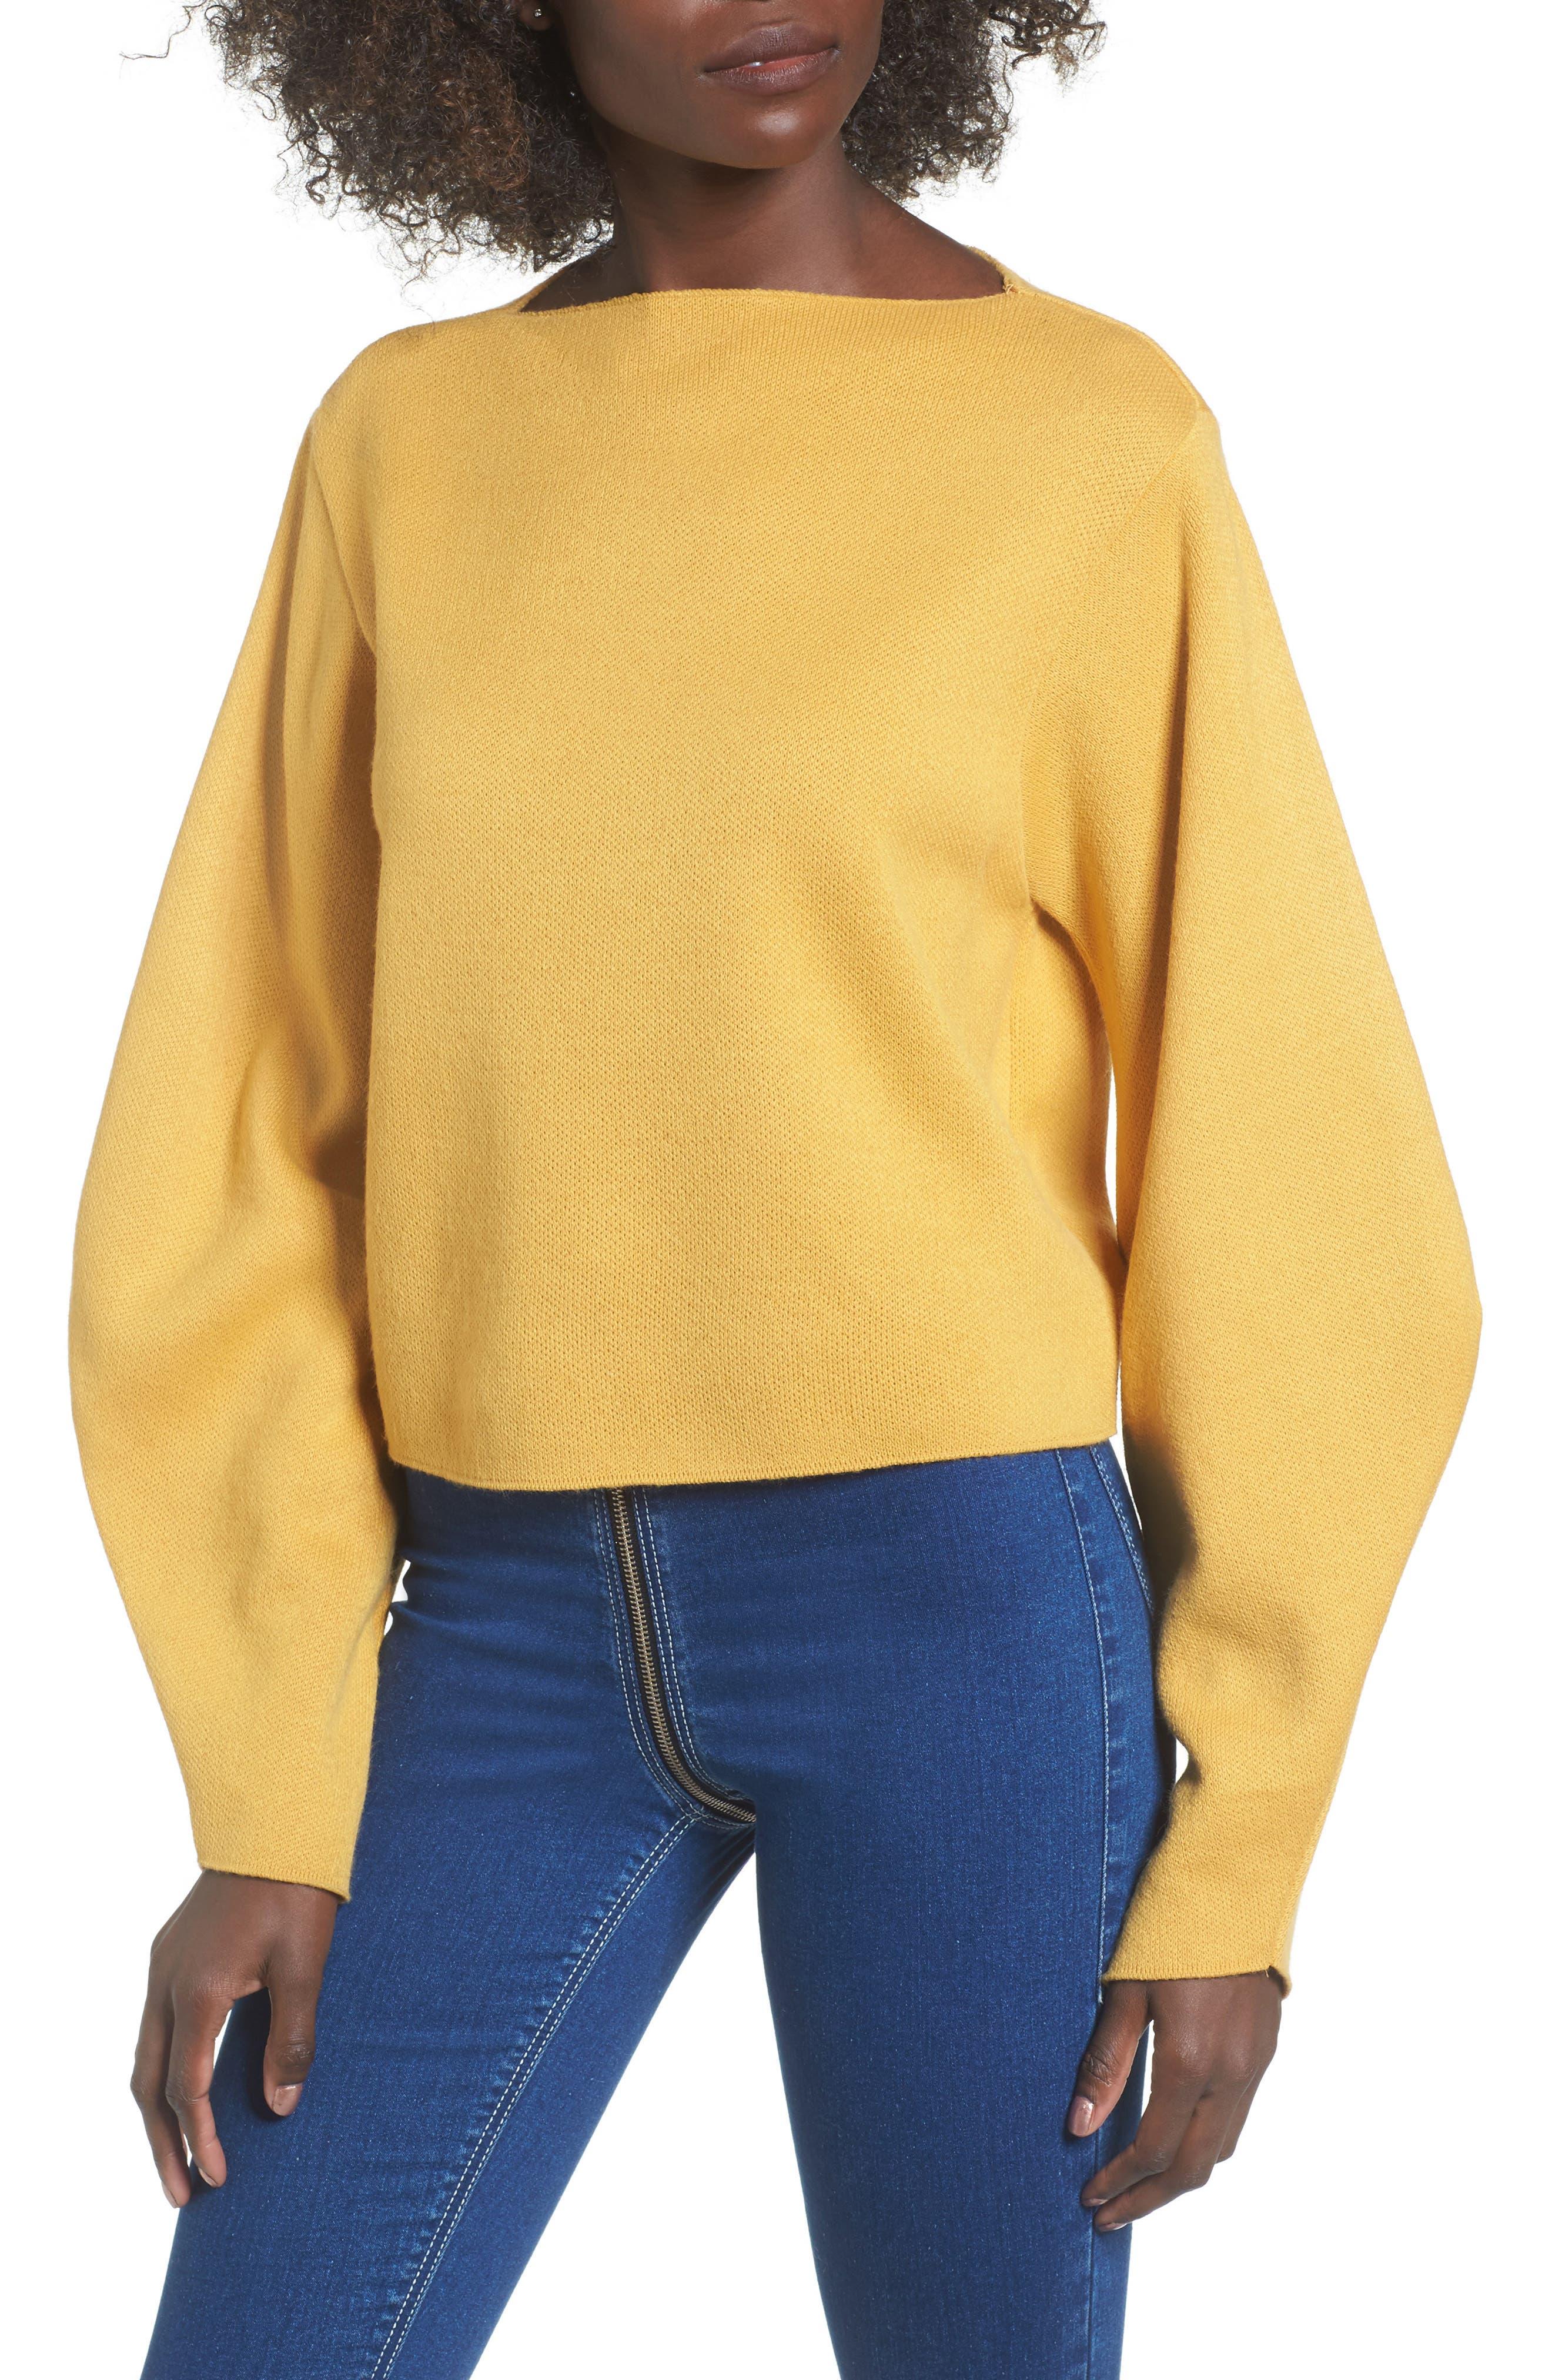 Alternate Image 1 Selected - Topshop Balloon Sleeve Sweater